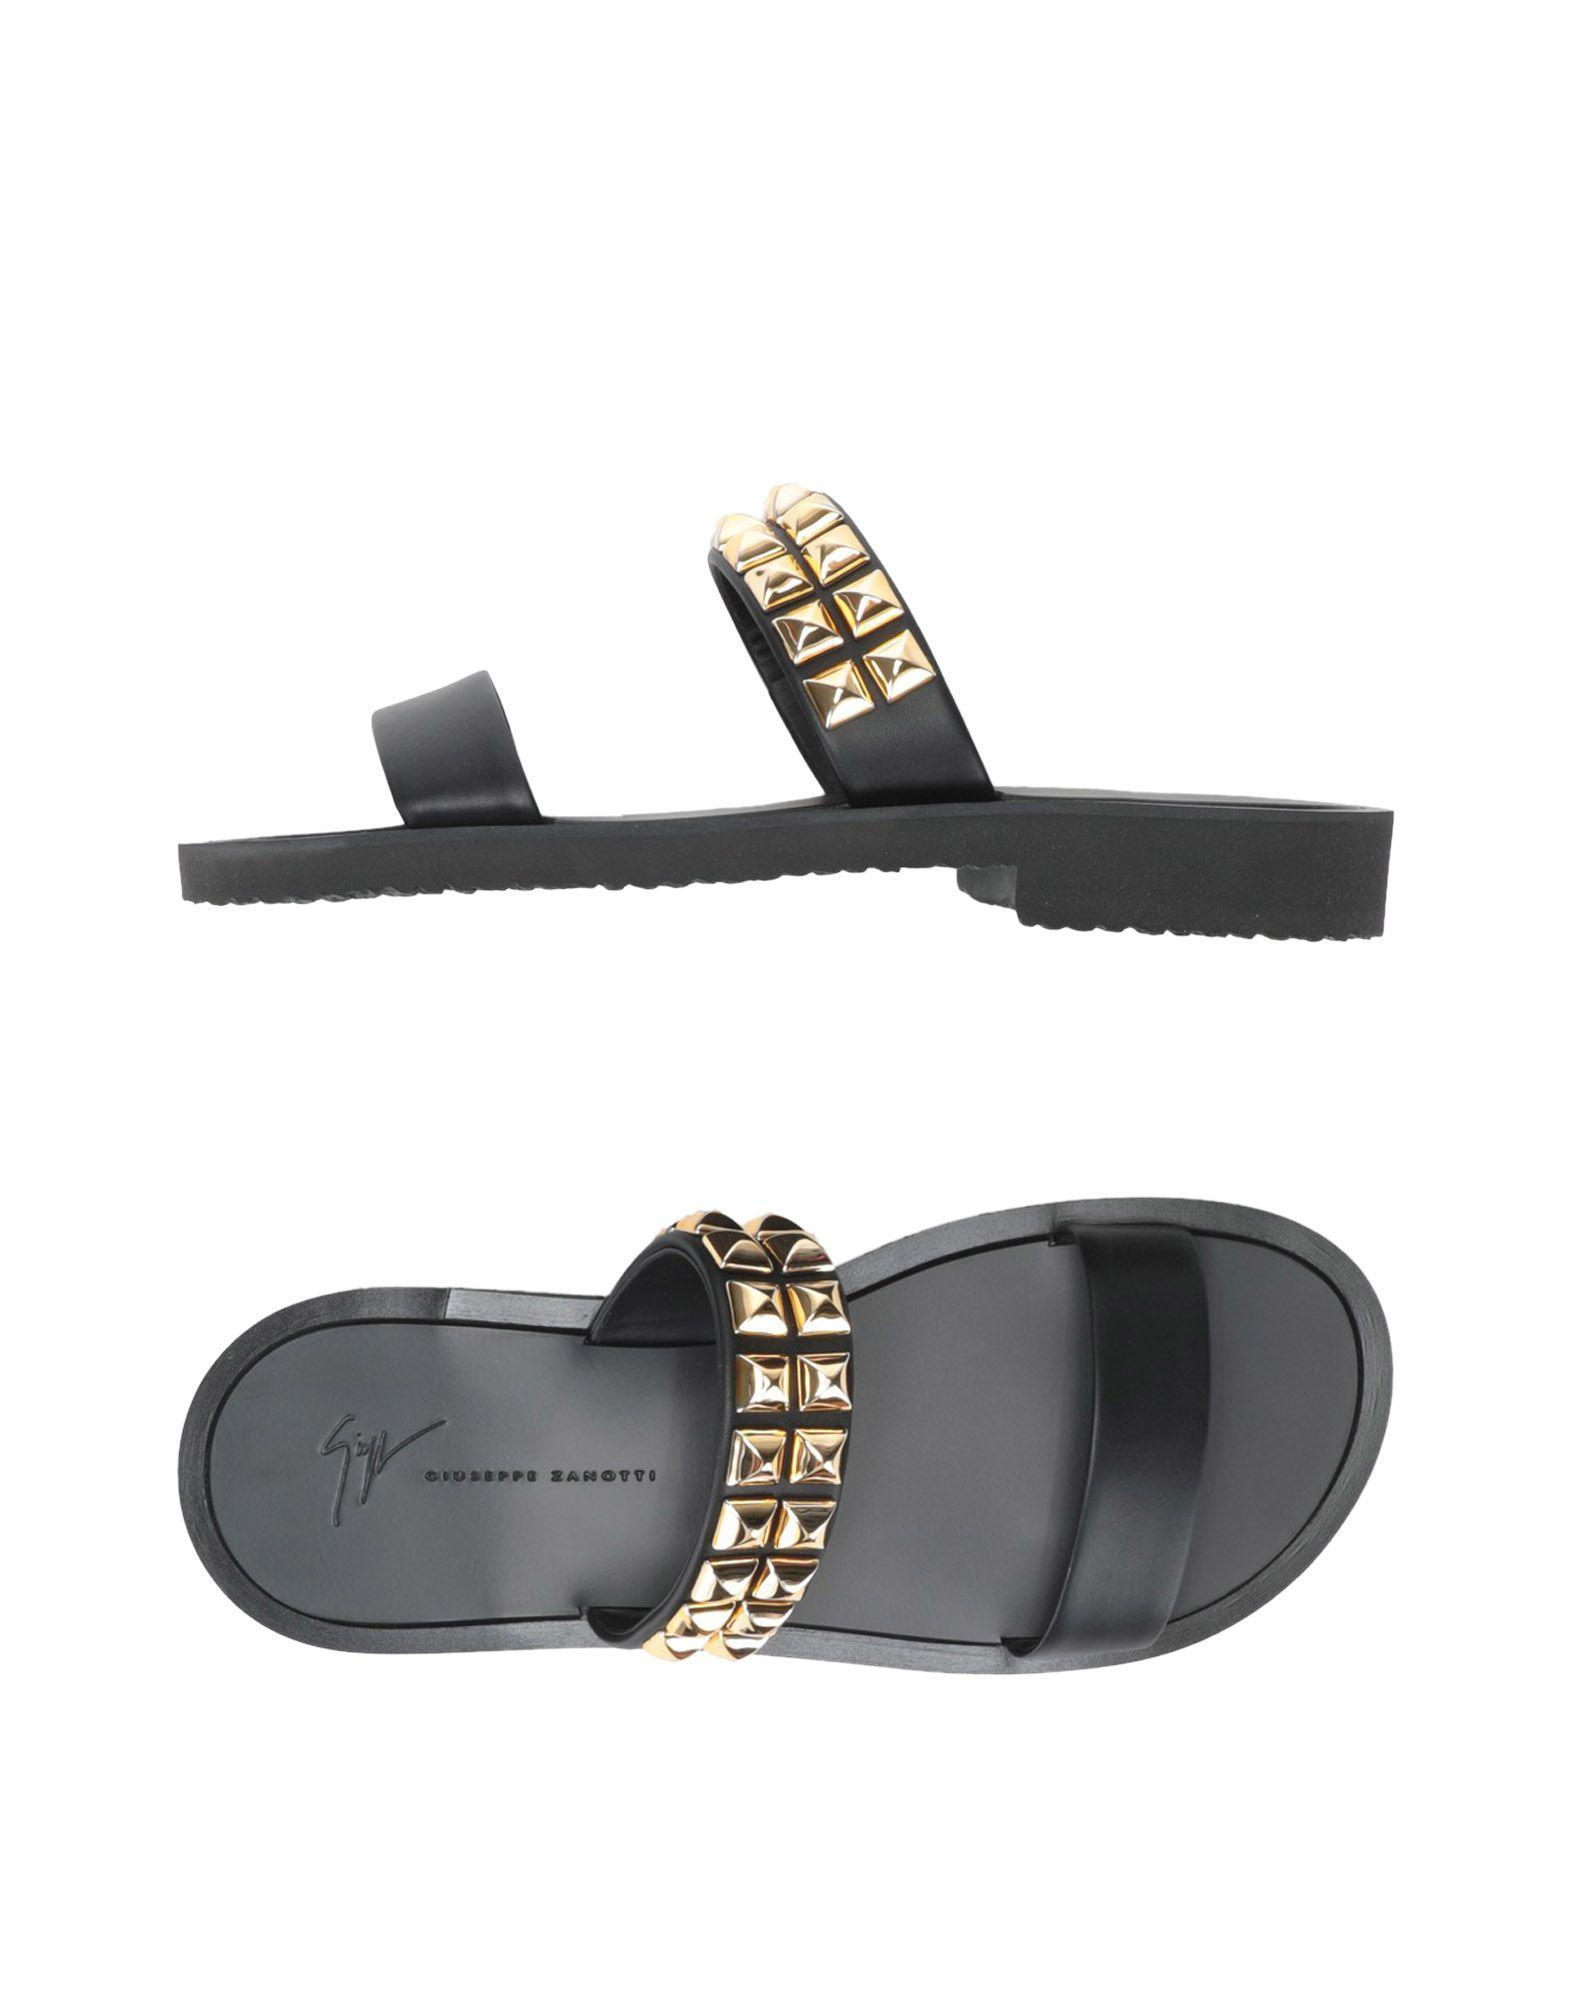 Giuseppe Zanotti Sandalen Herren  11517850UM Gute Qualität beliebte Schuhe